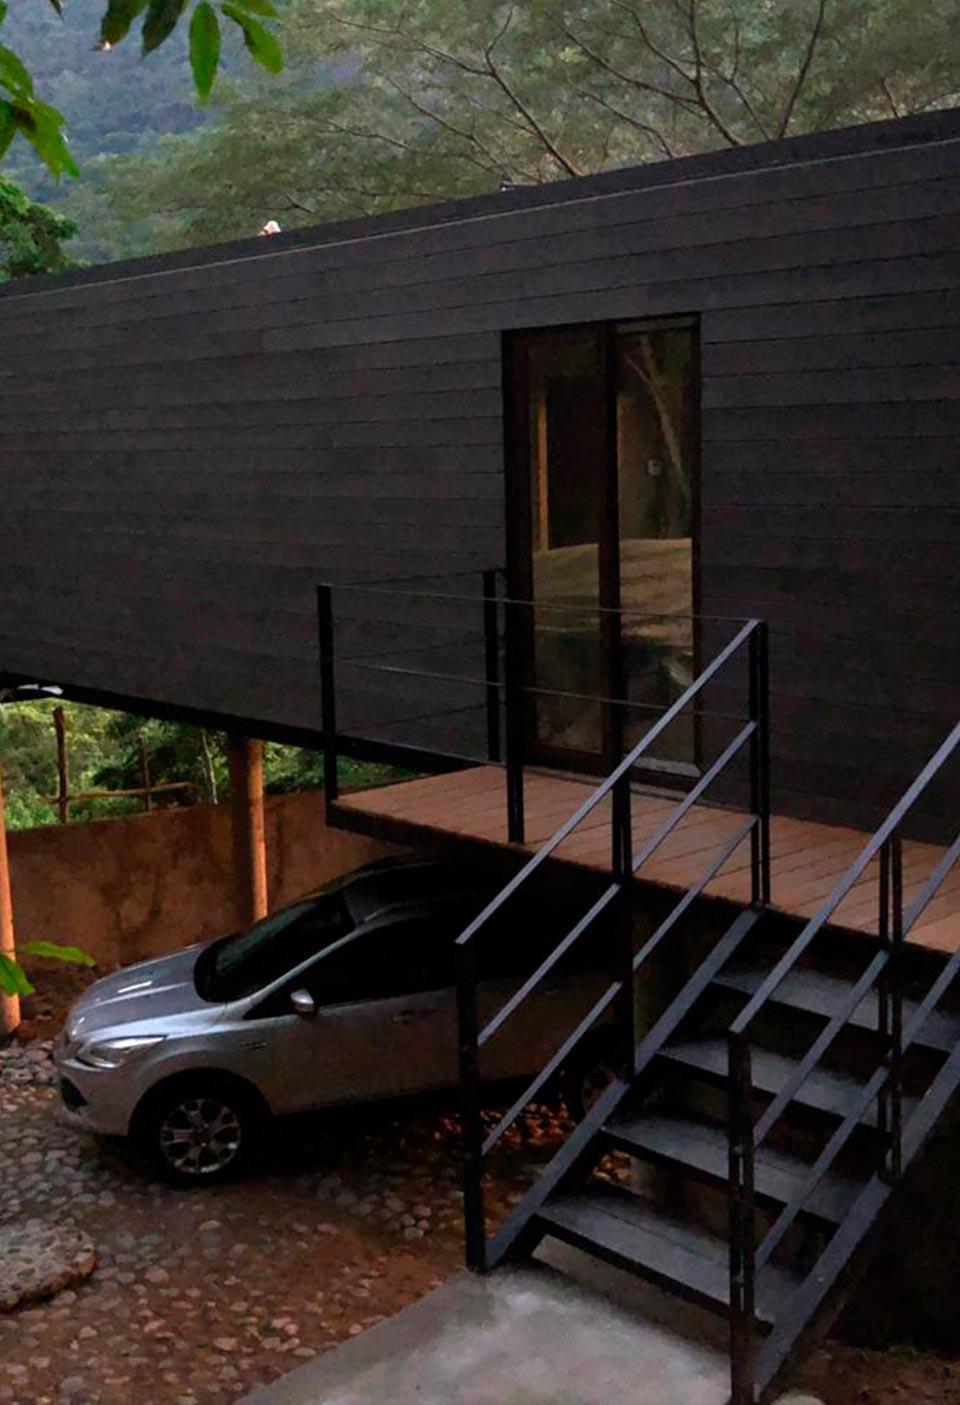 Taufic Luxury Design Departamento Boca de Tomatlan